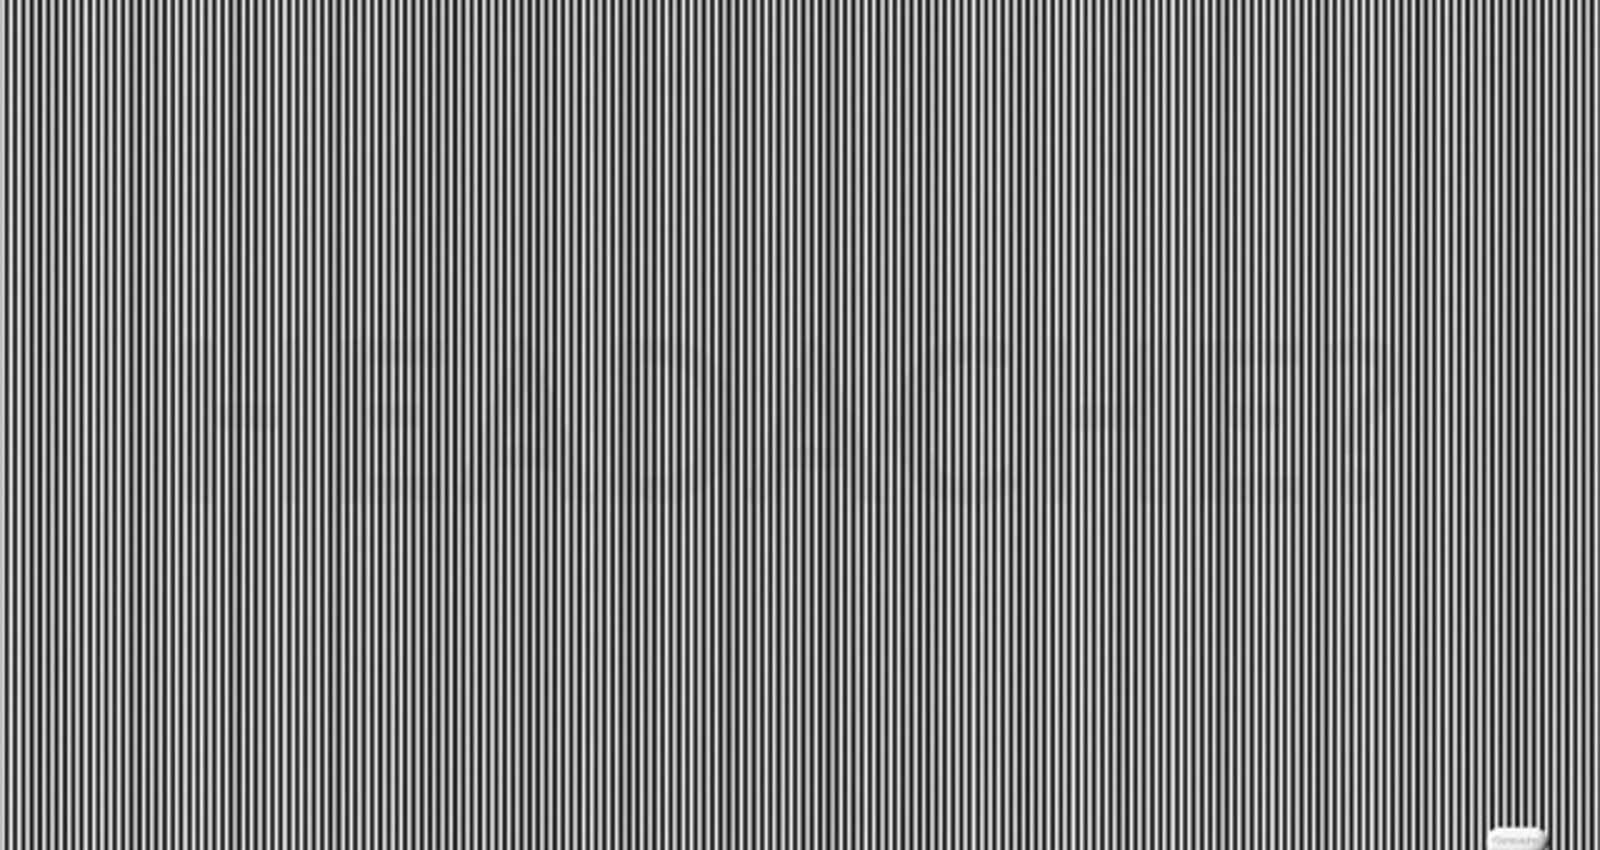 Spiral, Waves, Lines